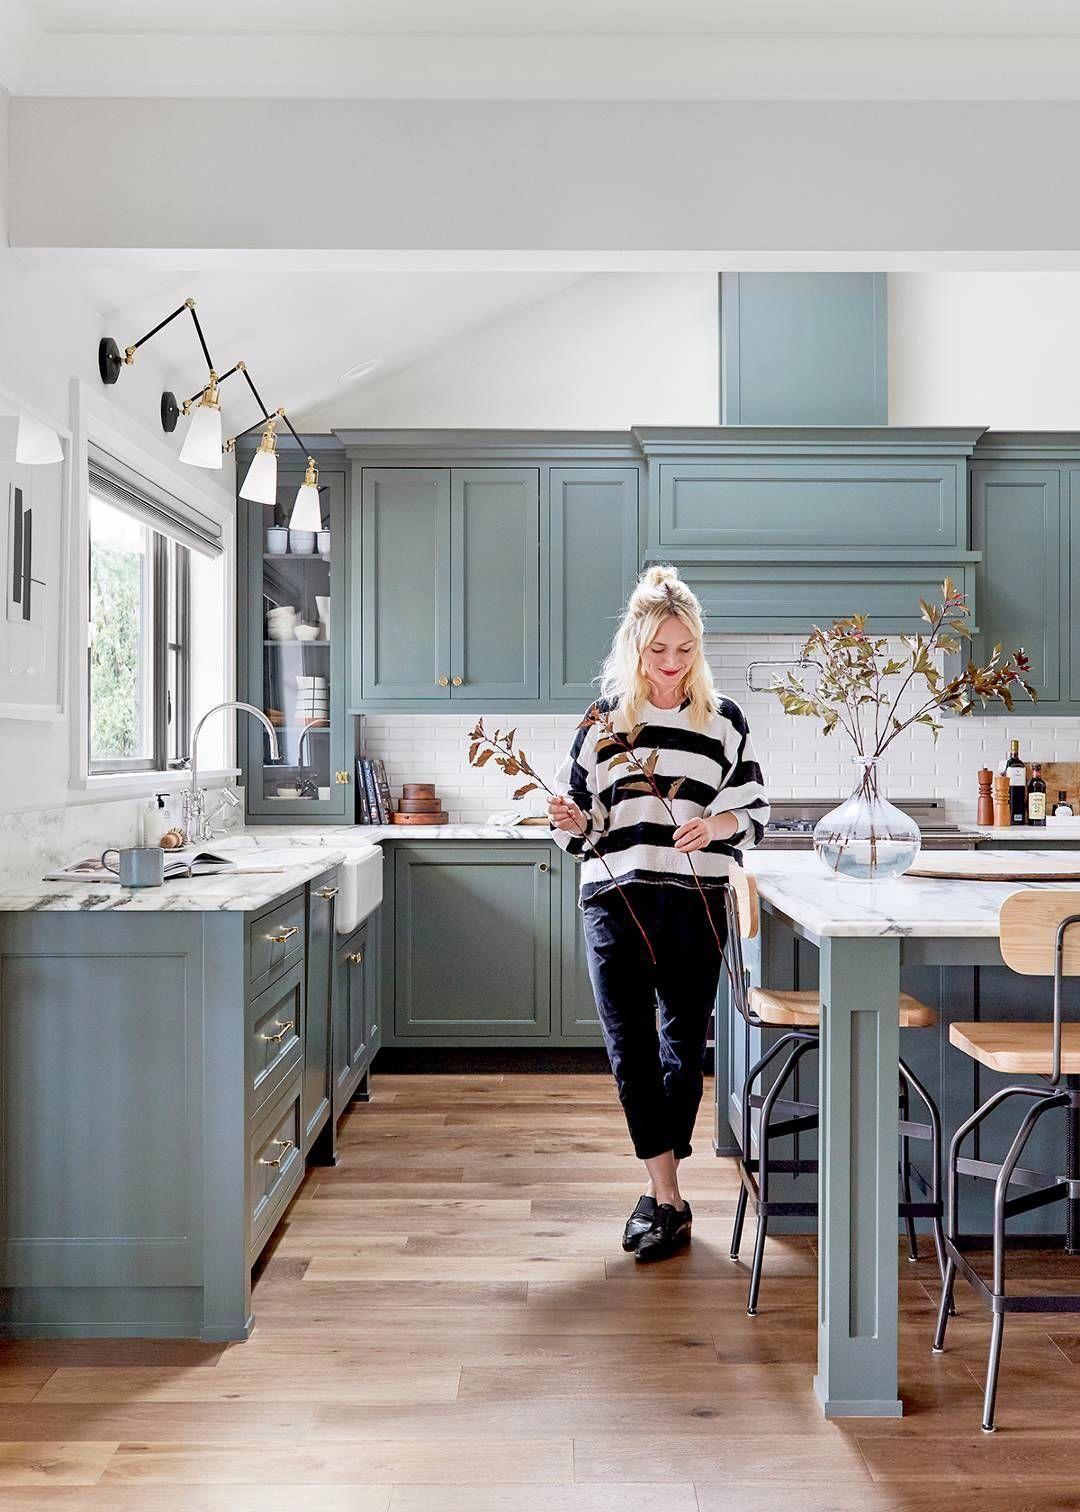 Decorating Kitchen Bulkheads Pictures Decoratingkitchen Interior Design Kitchen Green Kitchen Cabinets Kitchen Color Trends